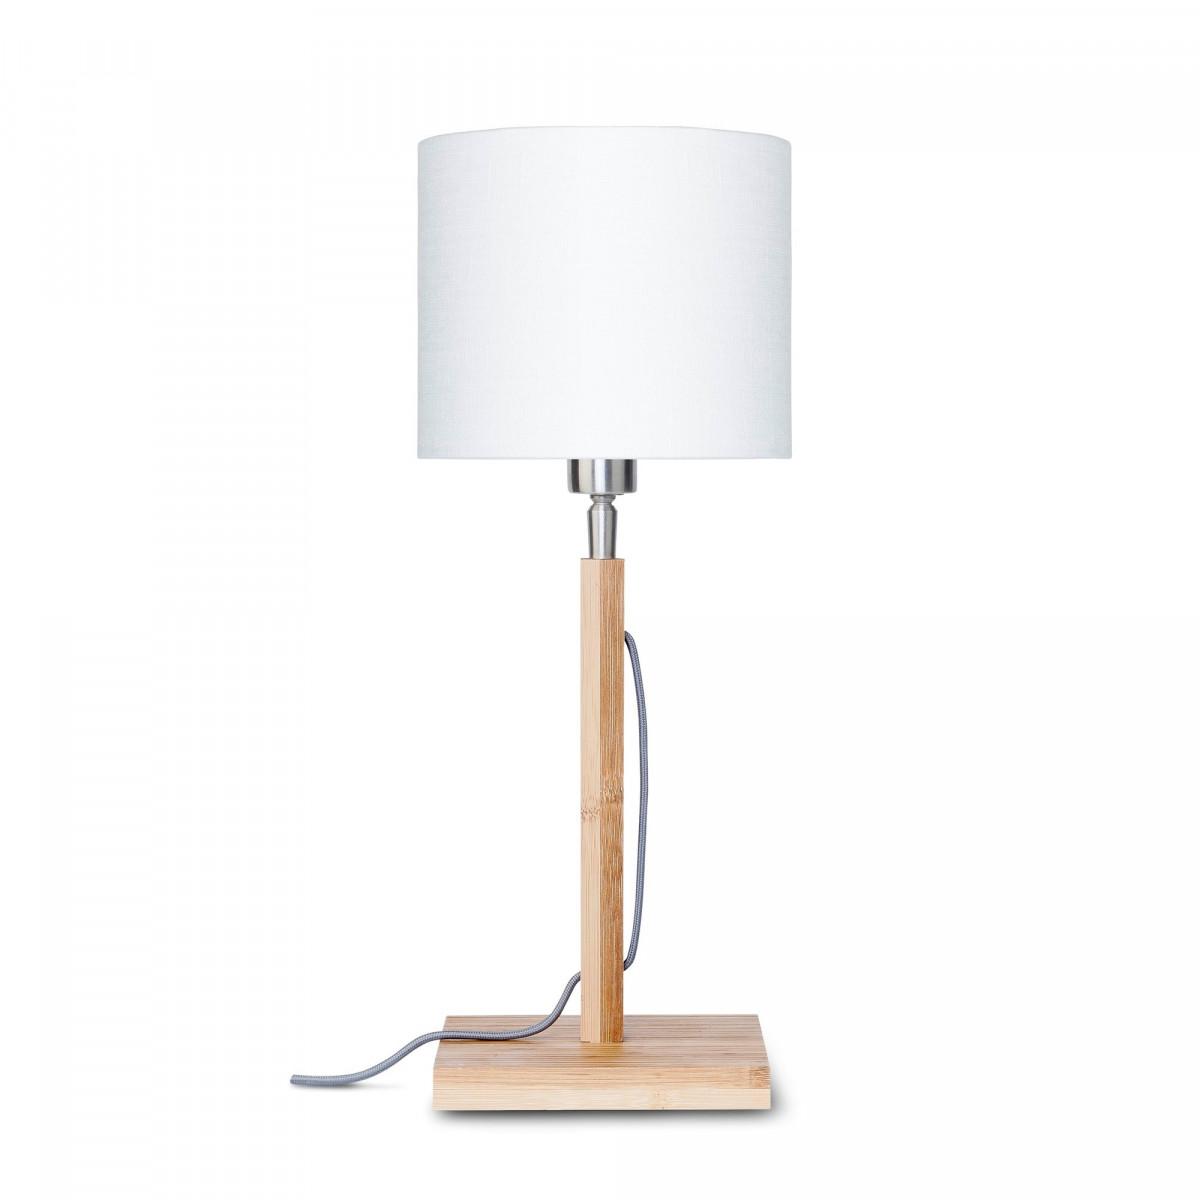 Lampe de table Fuji en bambou et lin Blancw